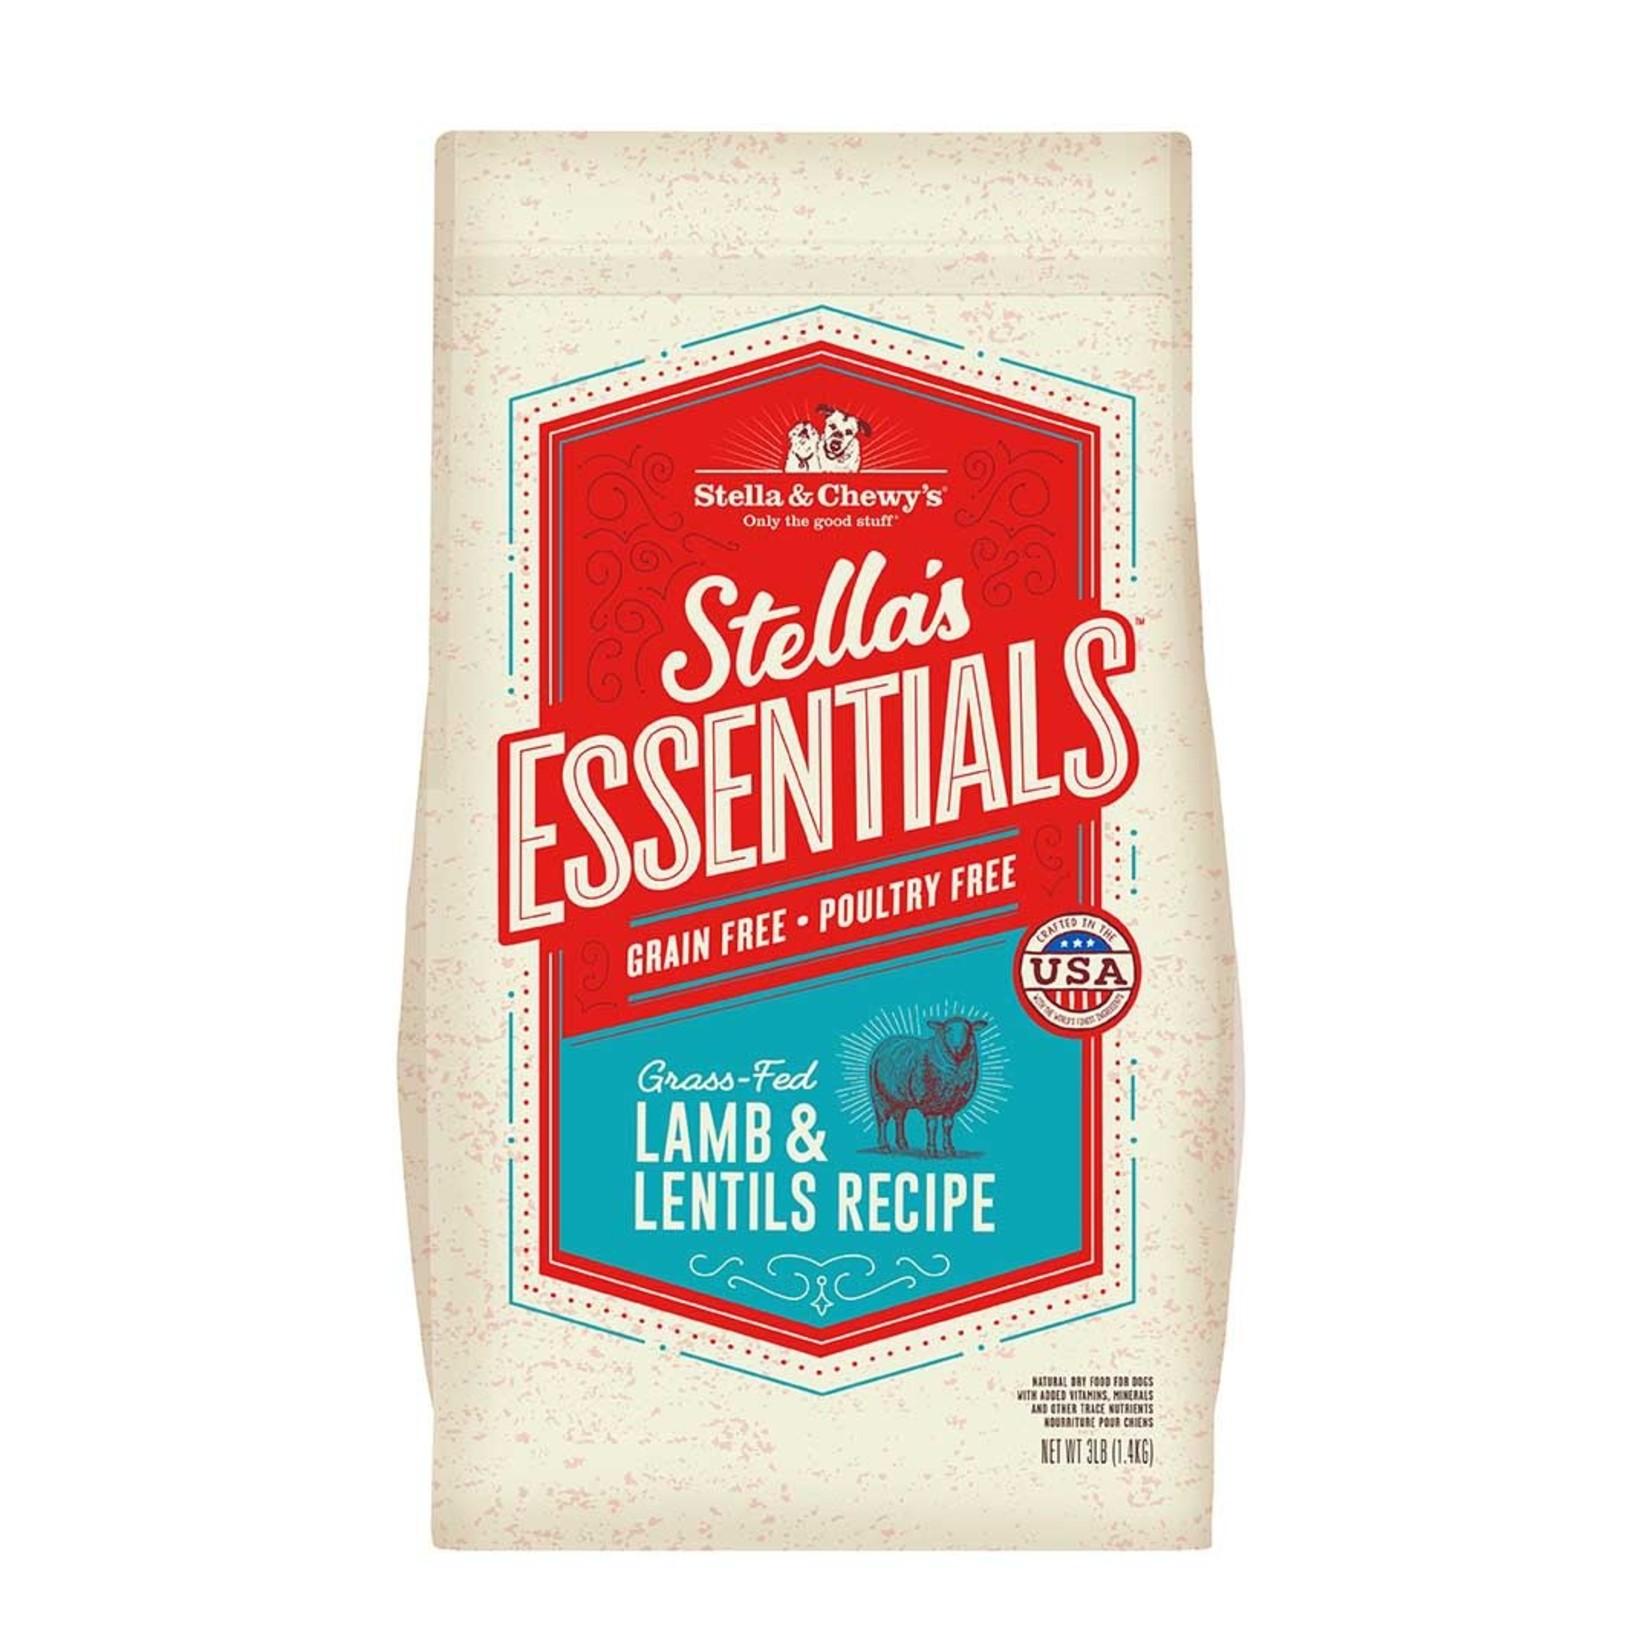 Stella & Chewys Stella & Chewy's Grain Free Lamb & Lentil 3#